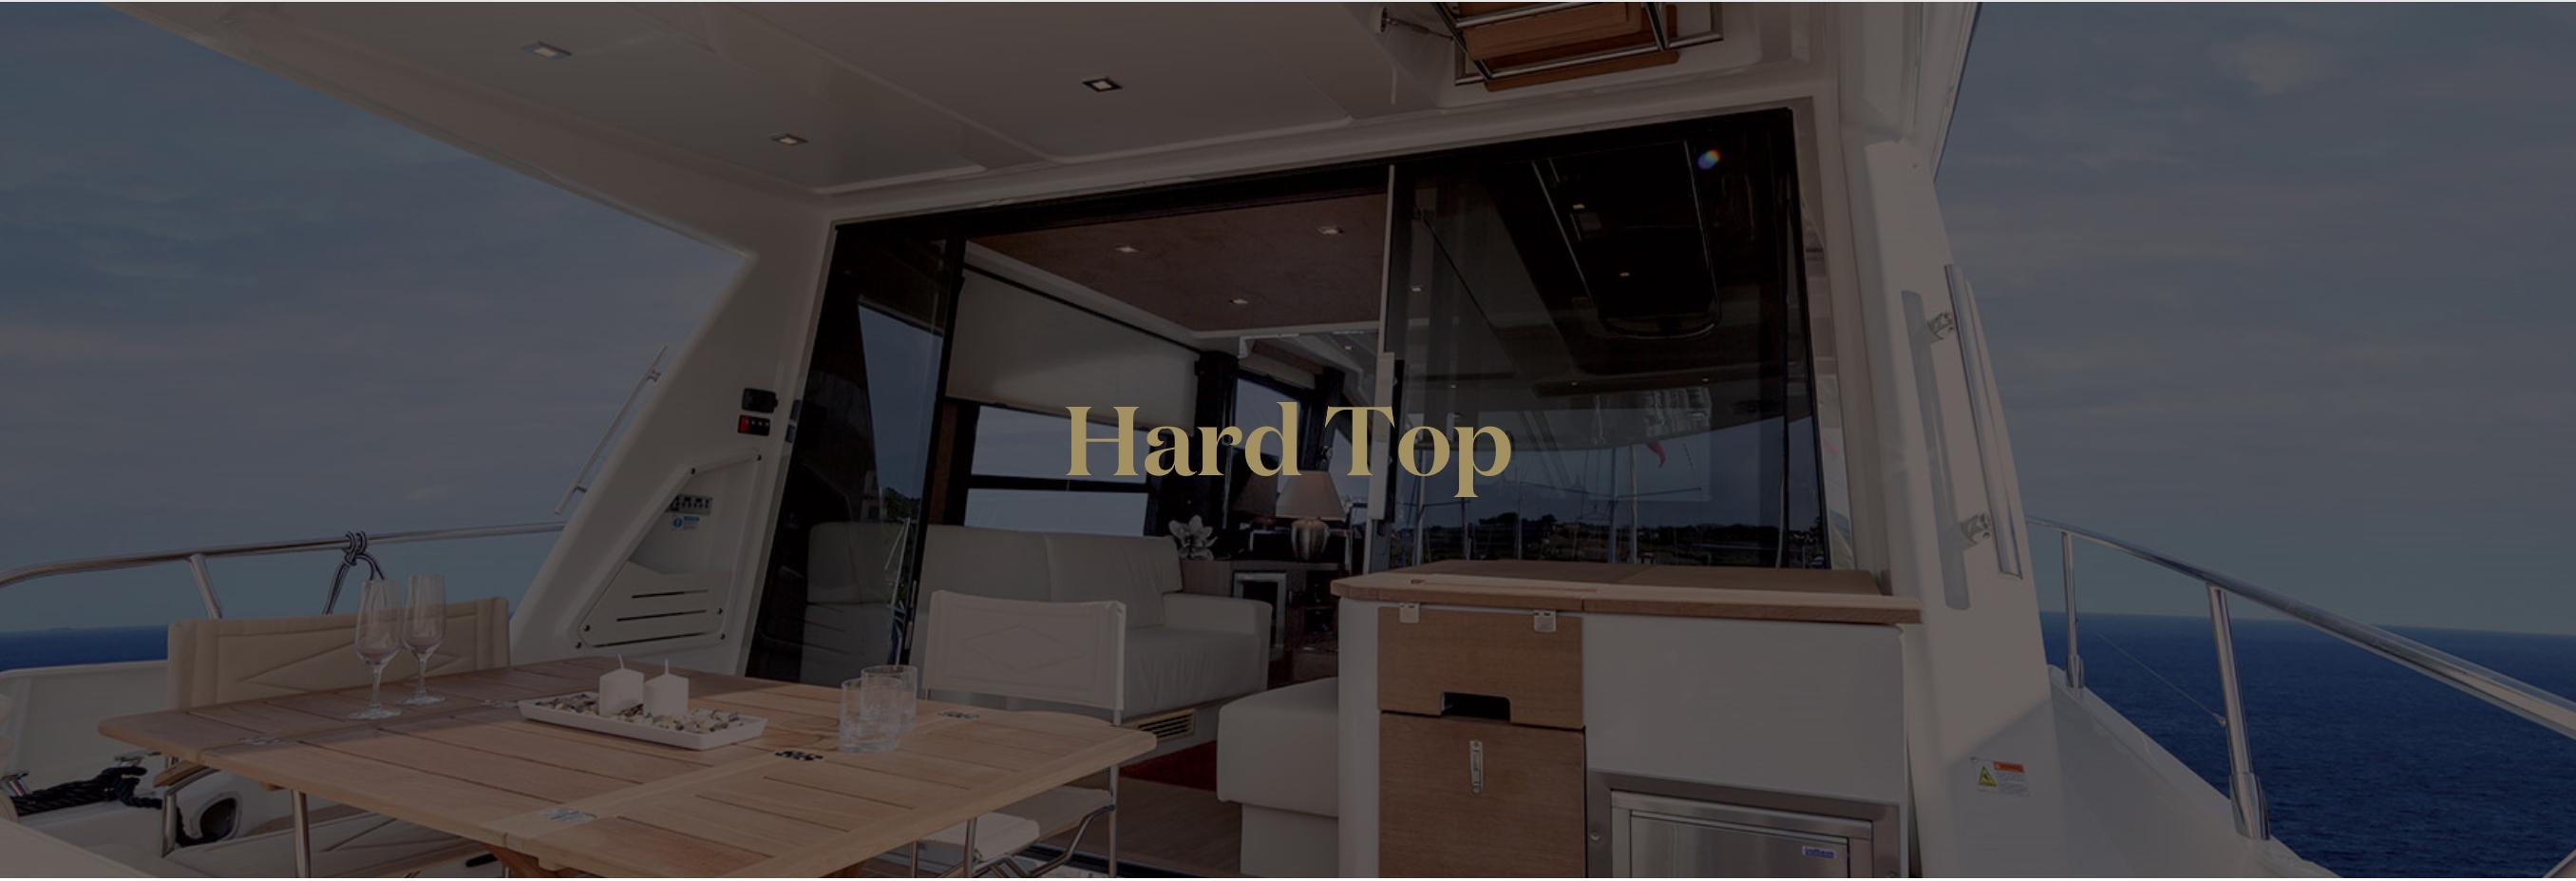 hard top spalte